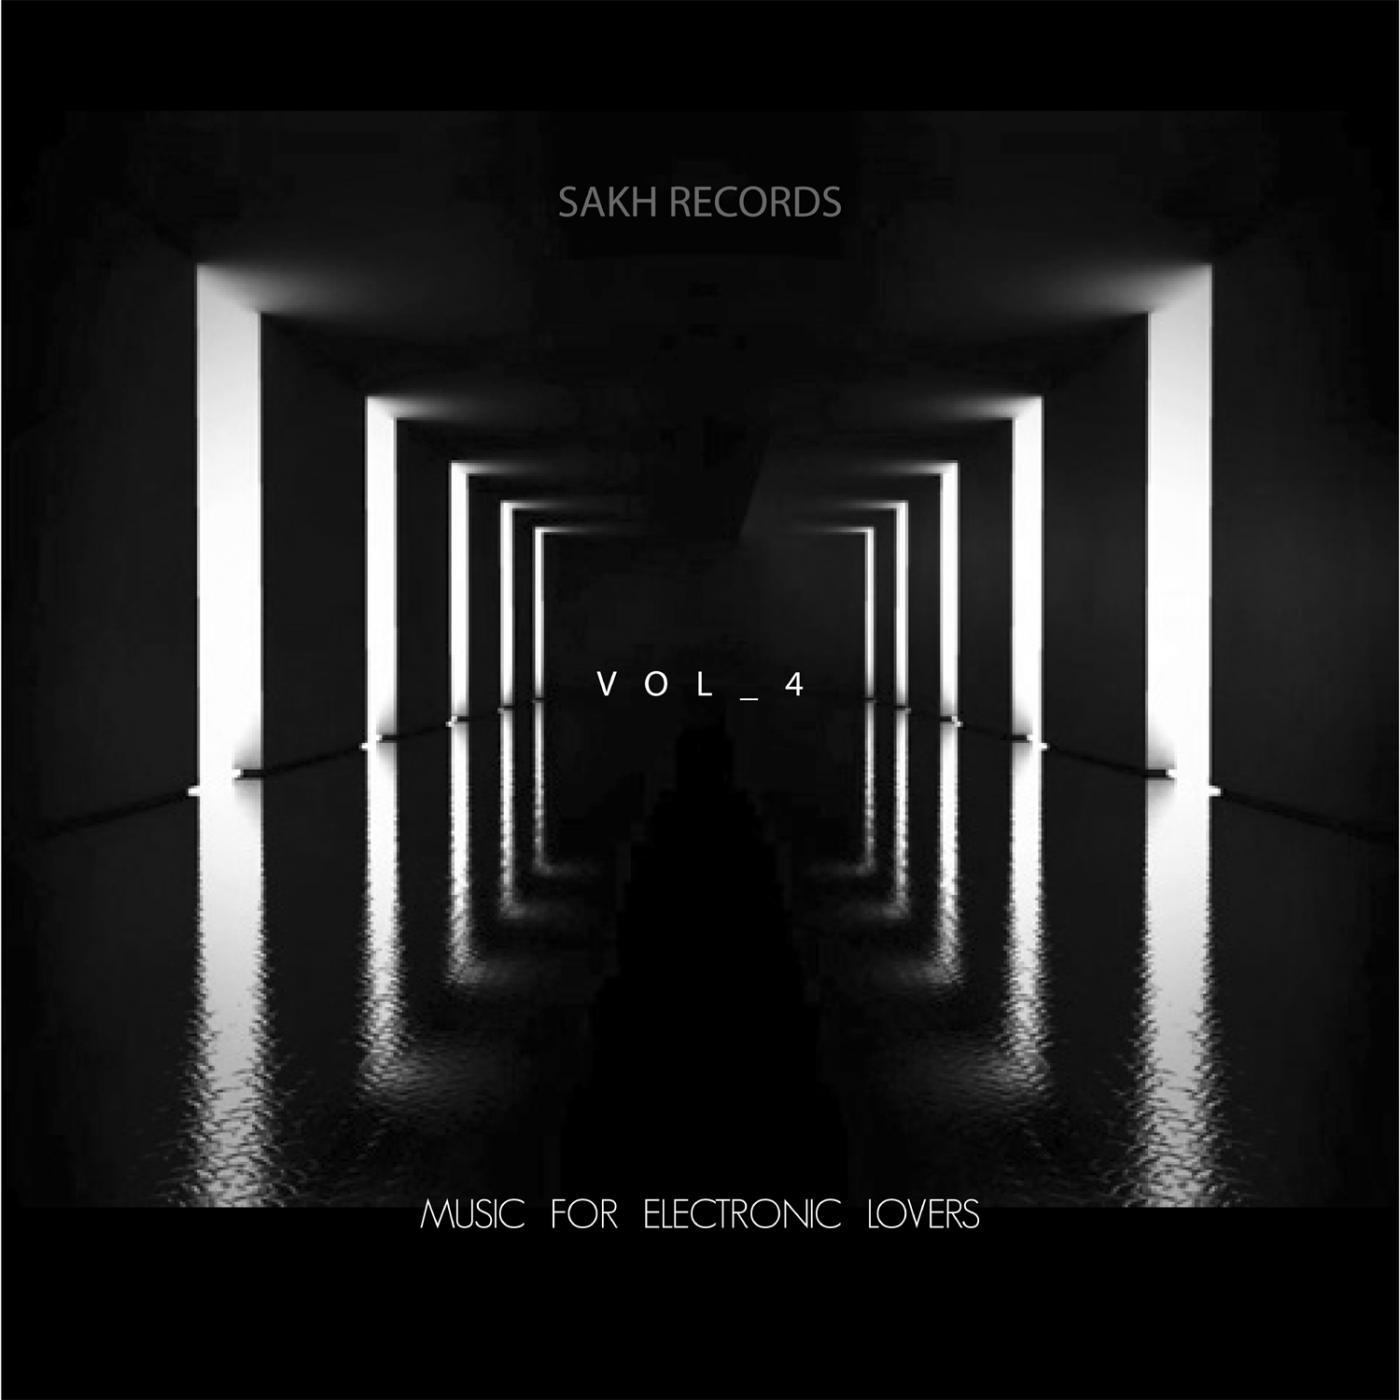 Crypto Bass - Dancing Alone In The Rain (Original Mix)